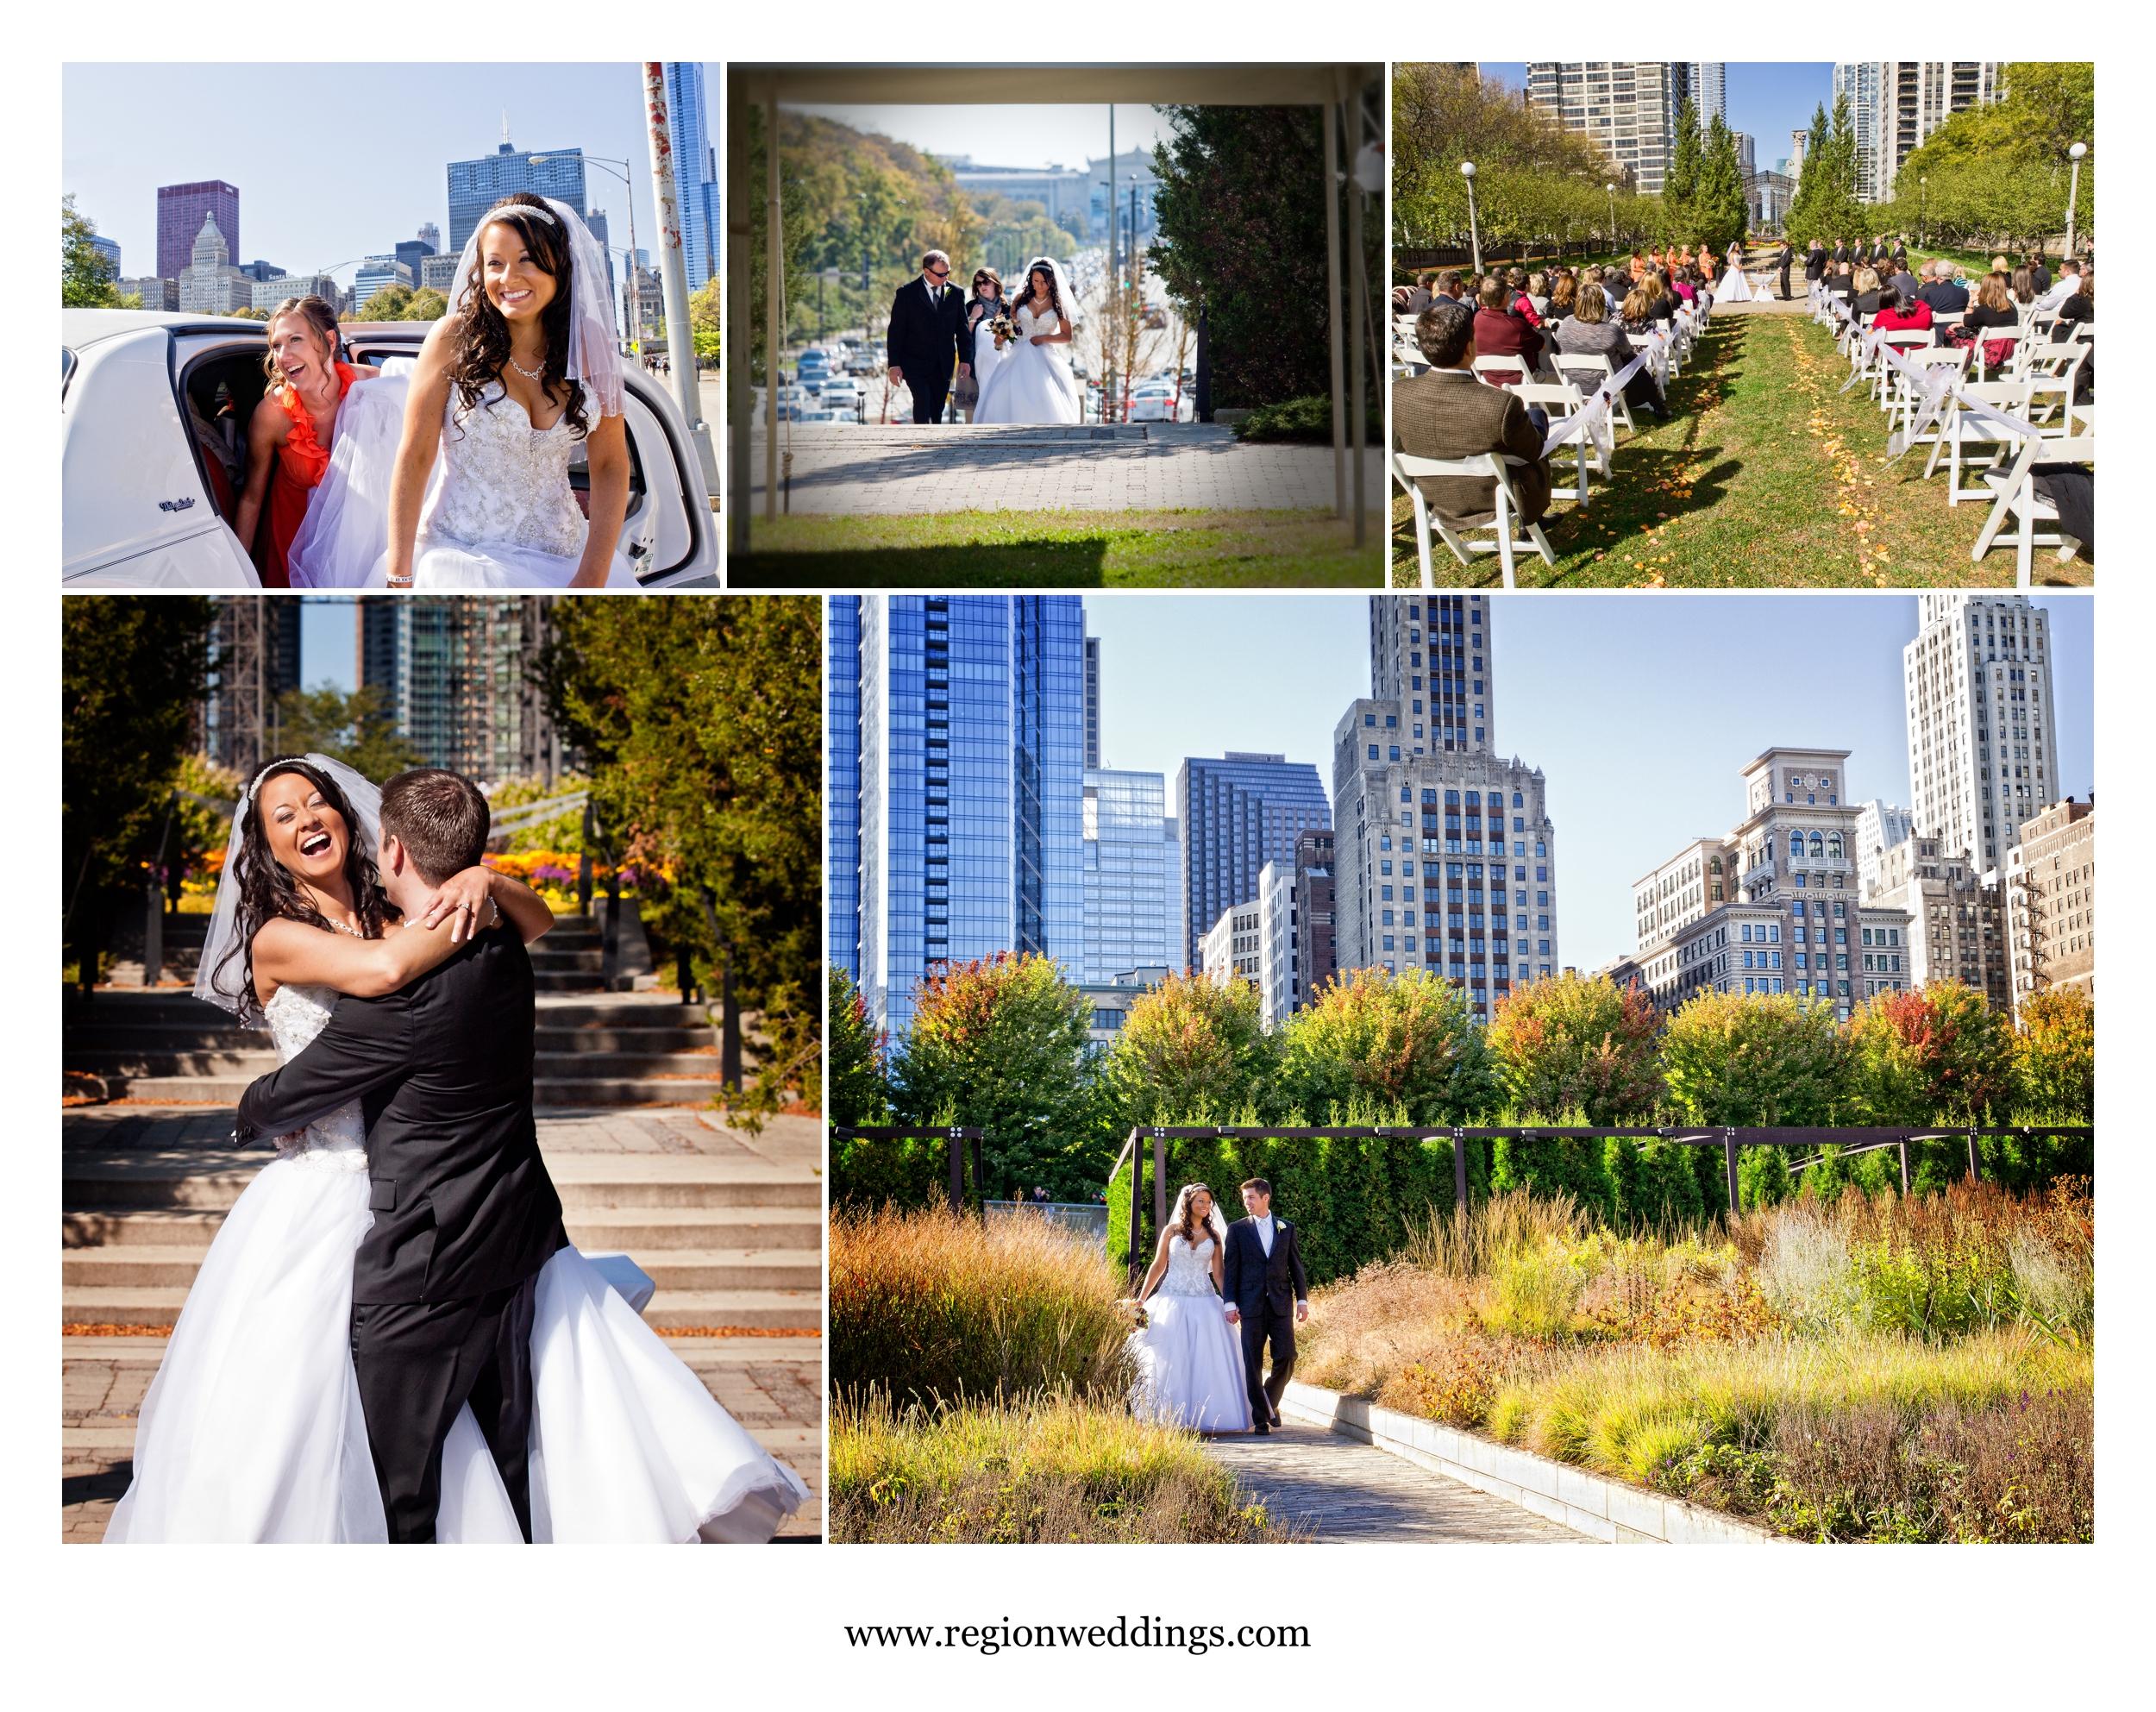 Outdoor Chicago wedding ceremony at the Cancer Survivor's Garden.